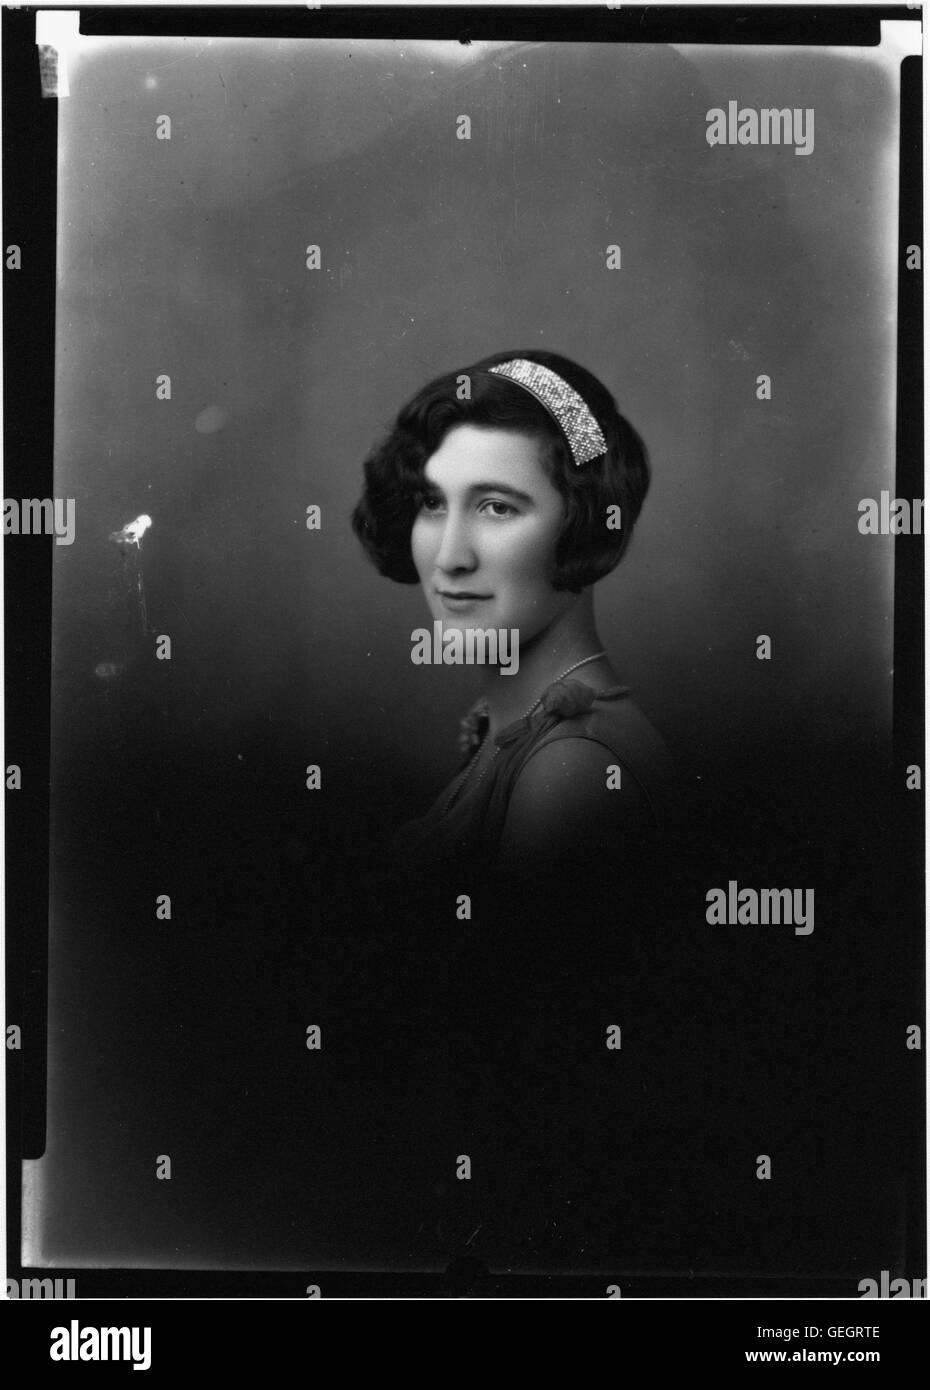 Portrait photograph of unidentified woman Stock Photo